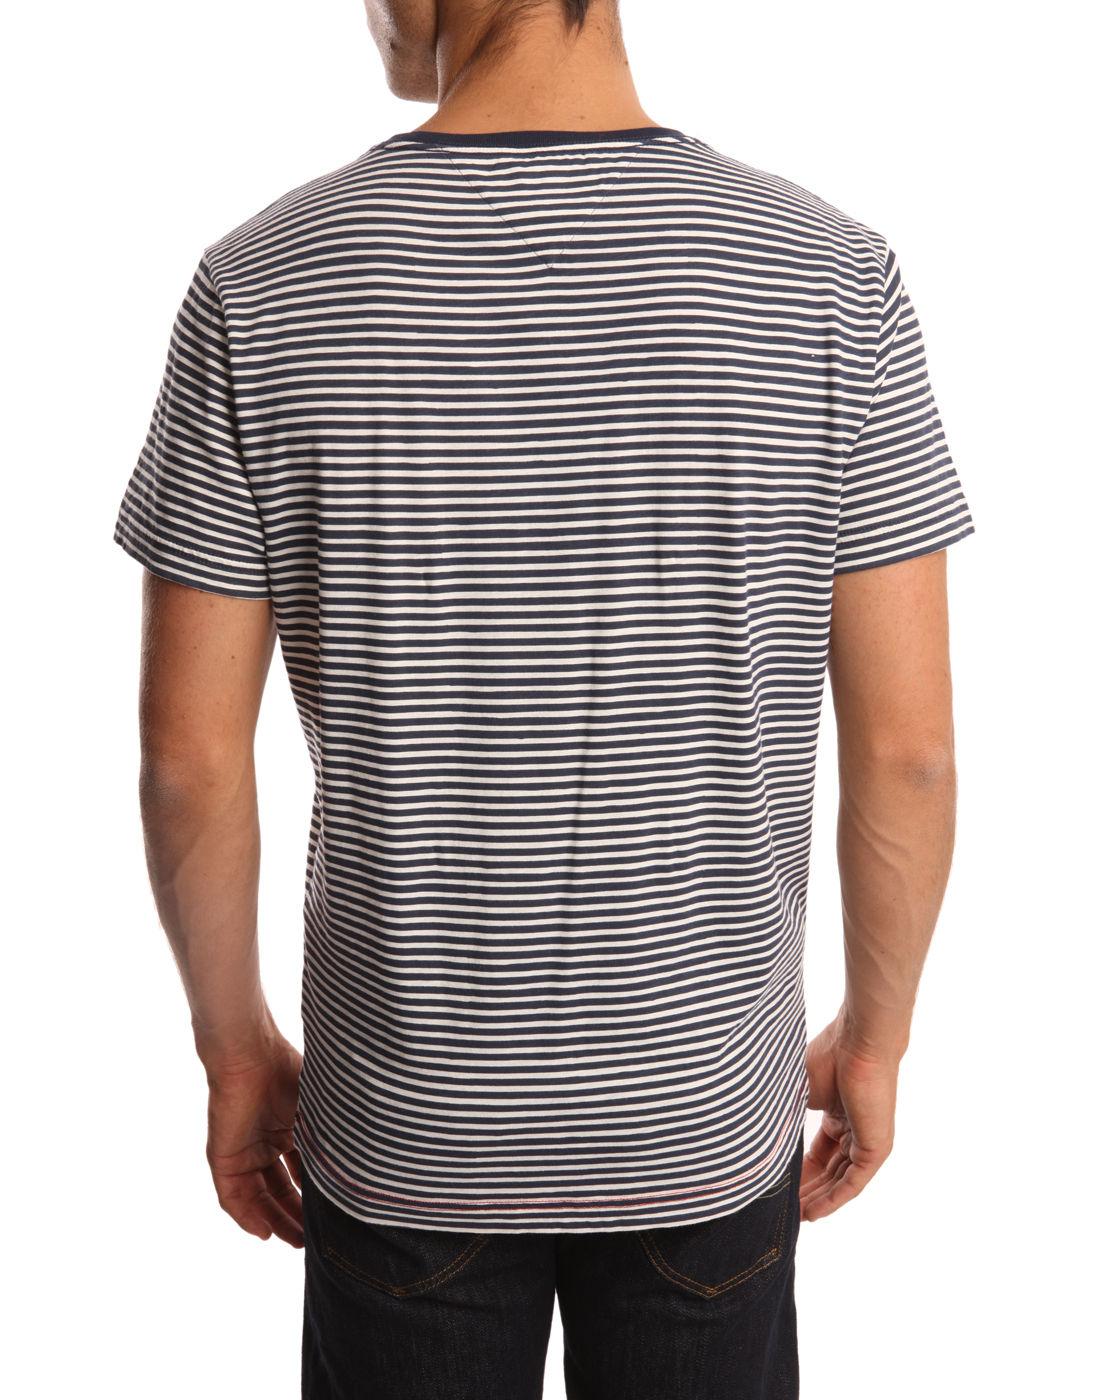 Tommy hilfiger anchor striped blue tshirt in blue for men for Tommy hilfiger fitzgerald striped shirt